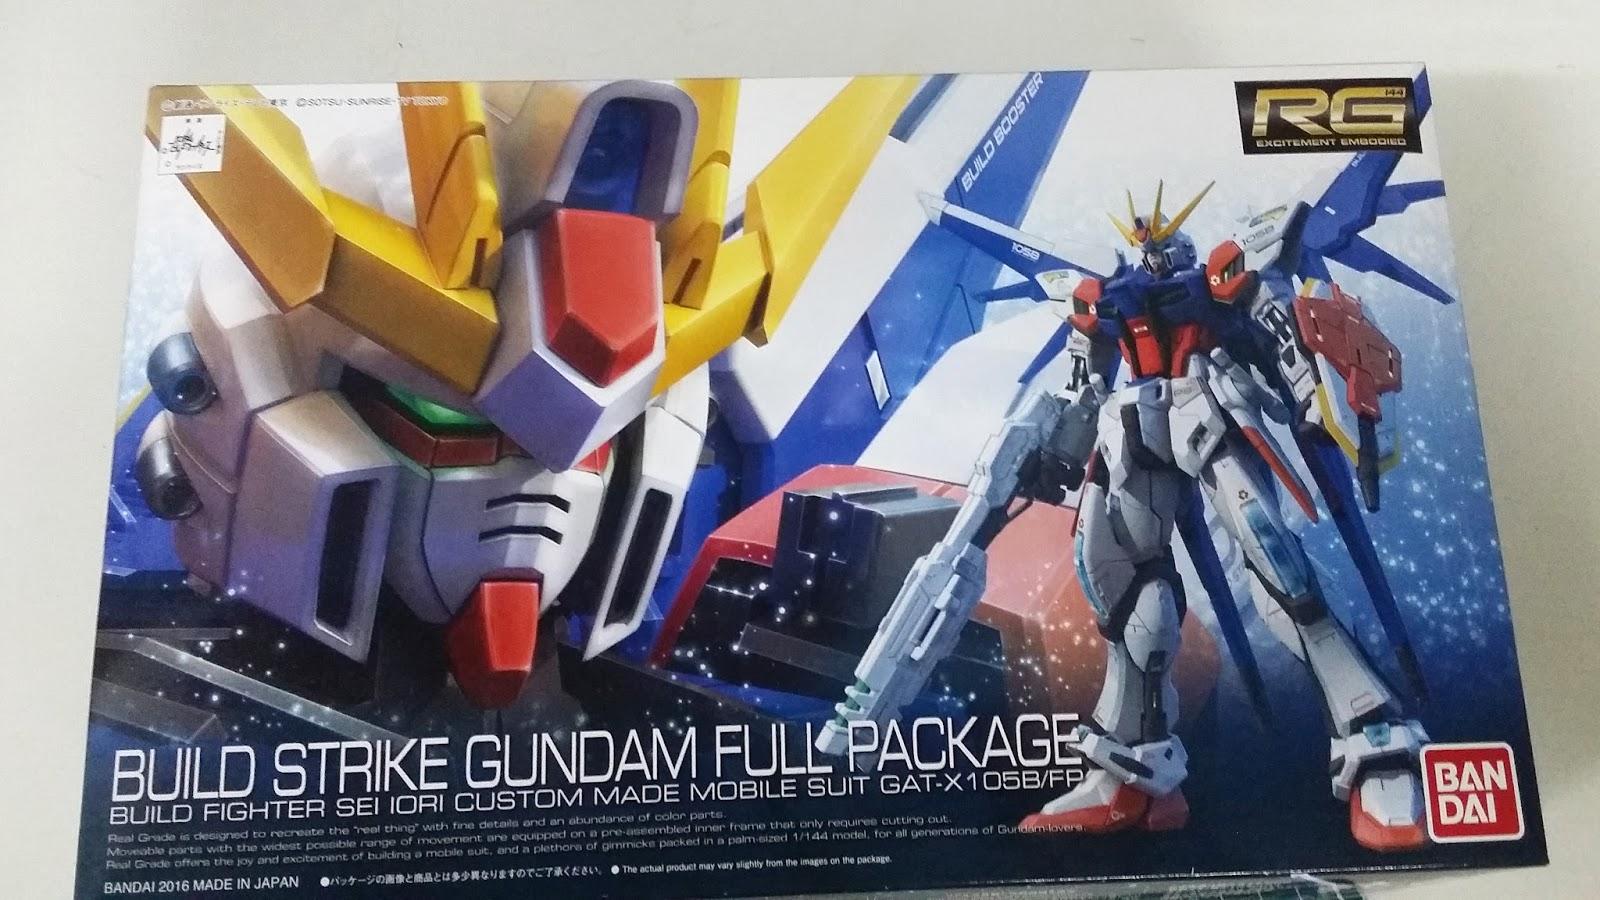 MG 1/100 Star Build Strike Gundam Plavsky Wing: Latest